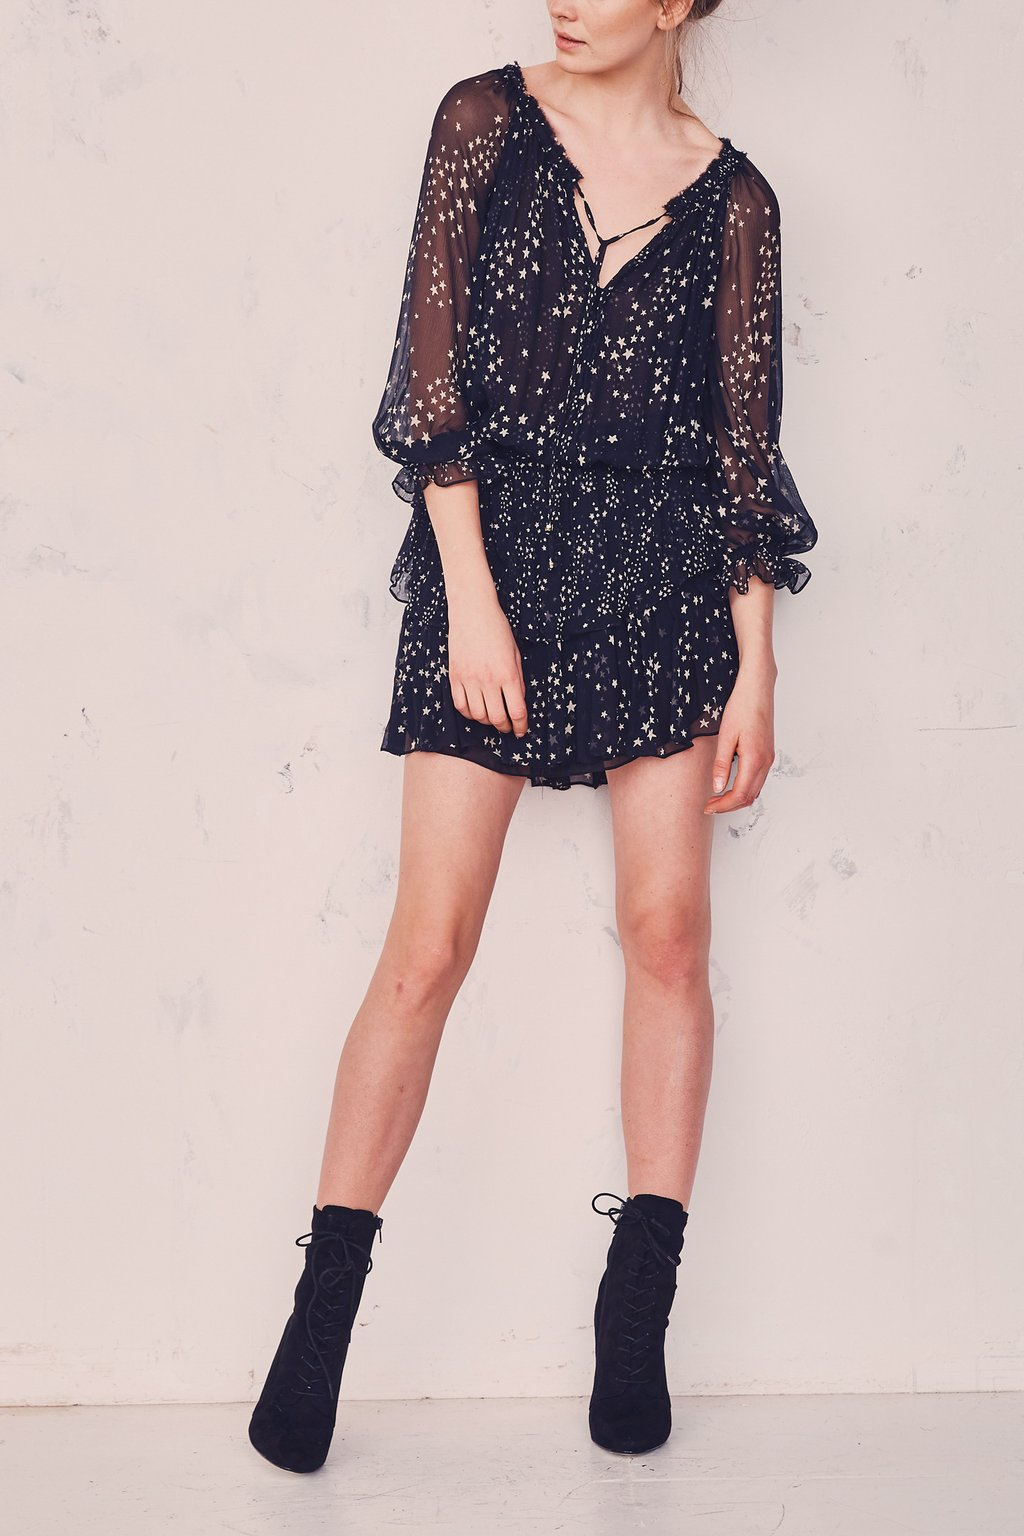 popover_dress_loveshackfancy_star_print_black_2_1024x.jpg